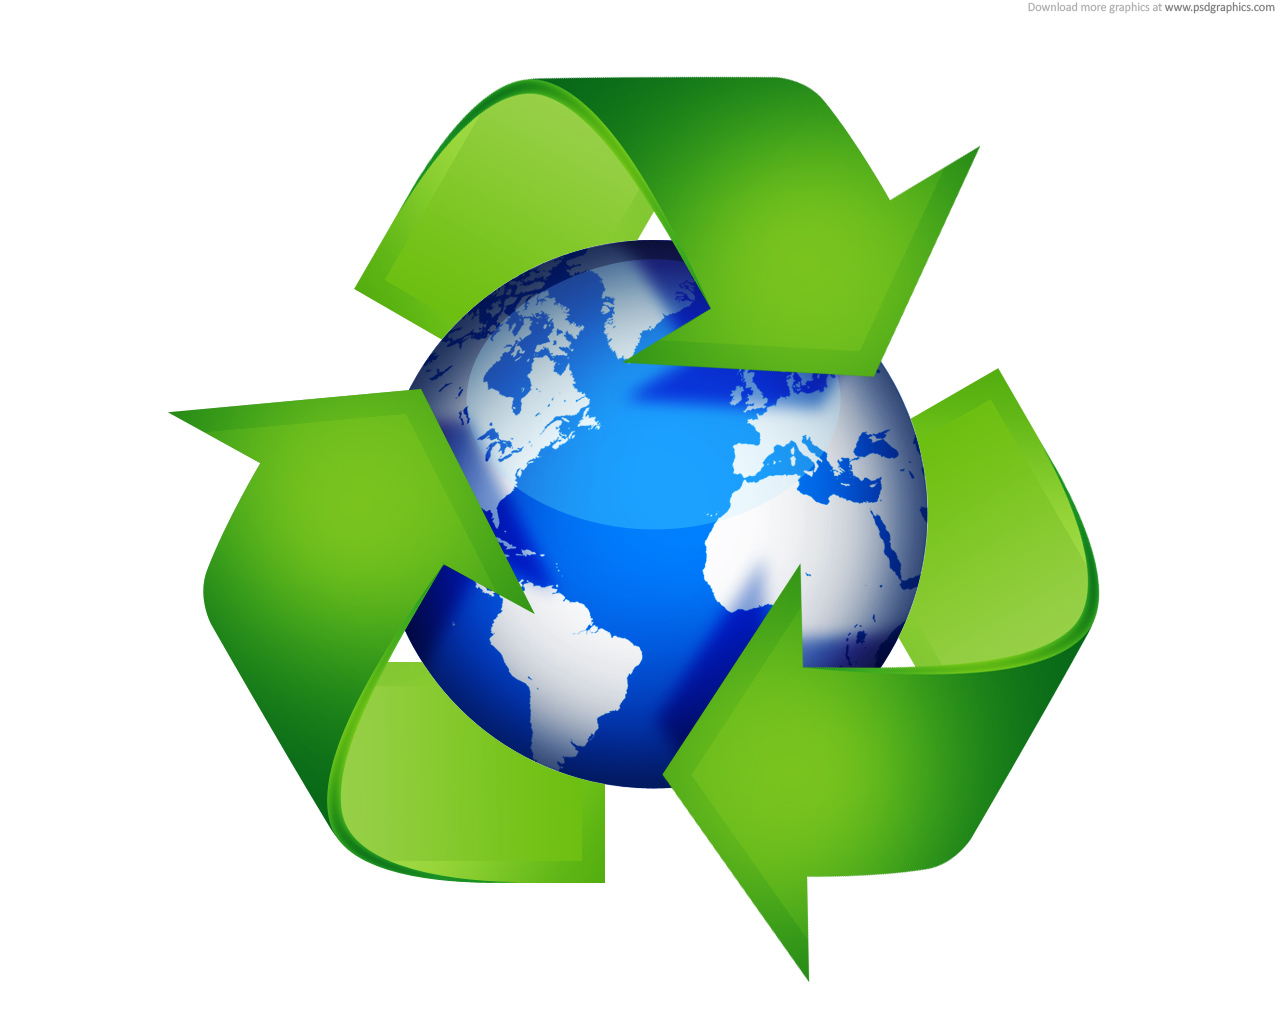 green-recycling-icon.jpg